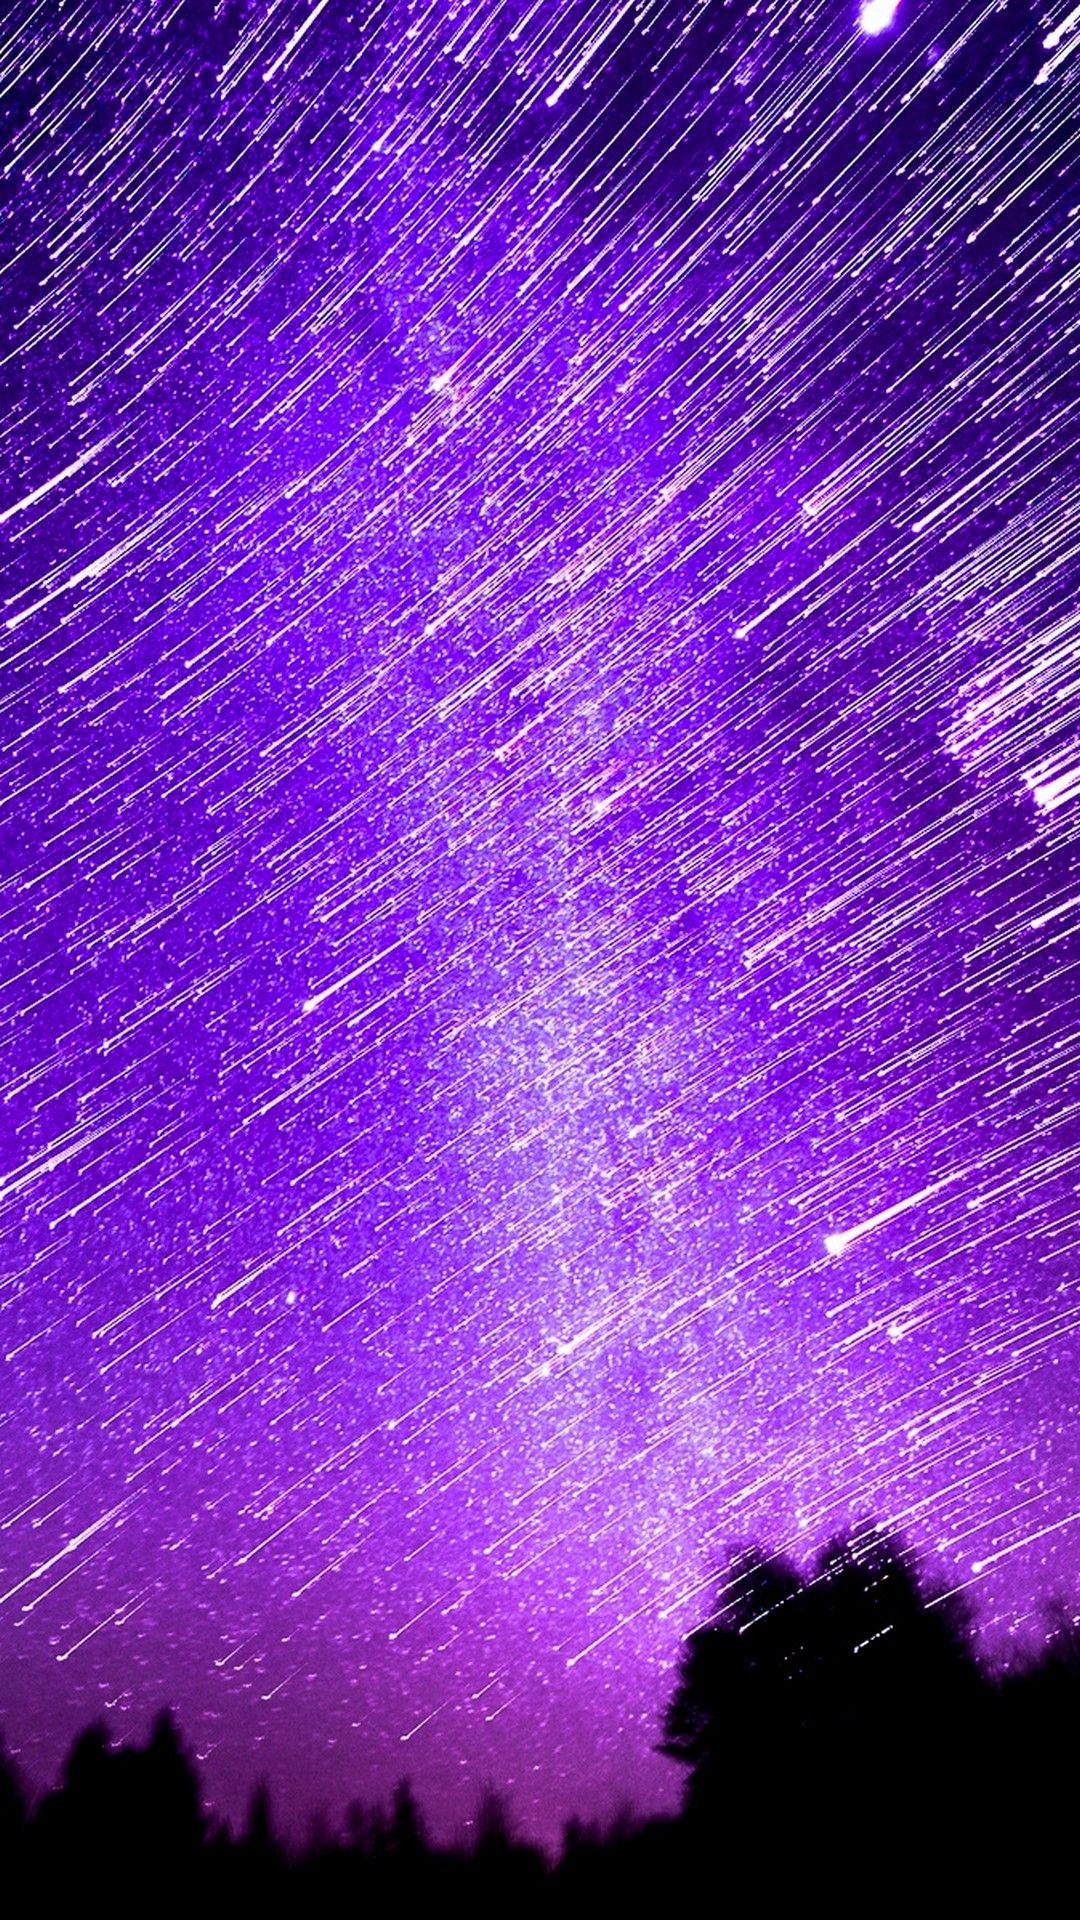 Aesthetic iPhone Purple Wallpapers   Top Aesthetic iPhone 1080x1920